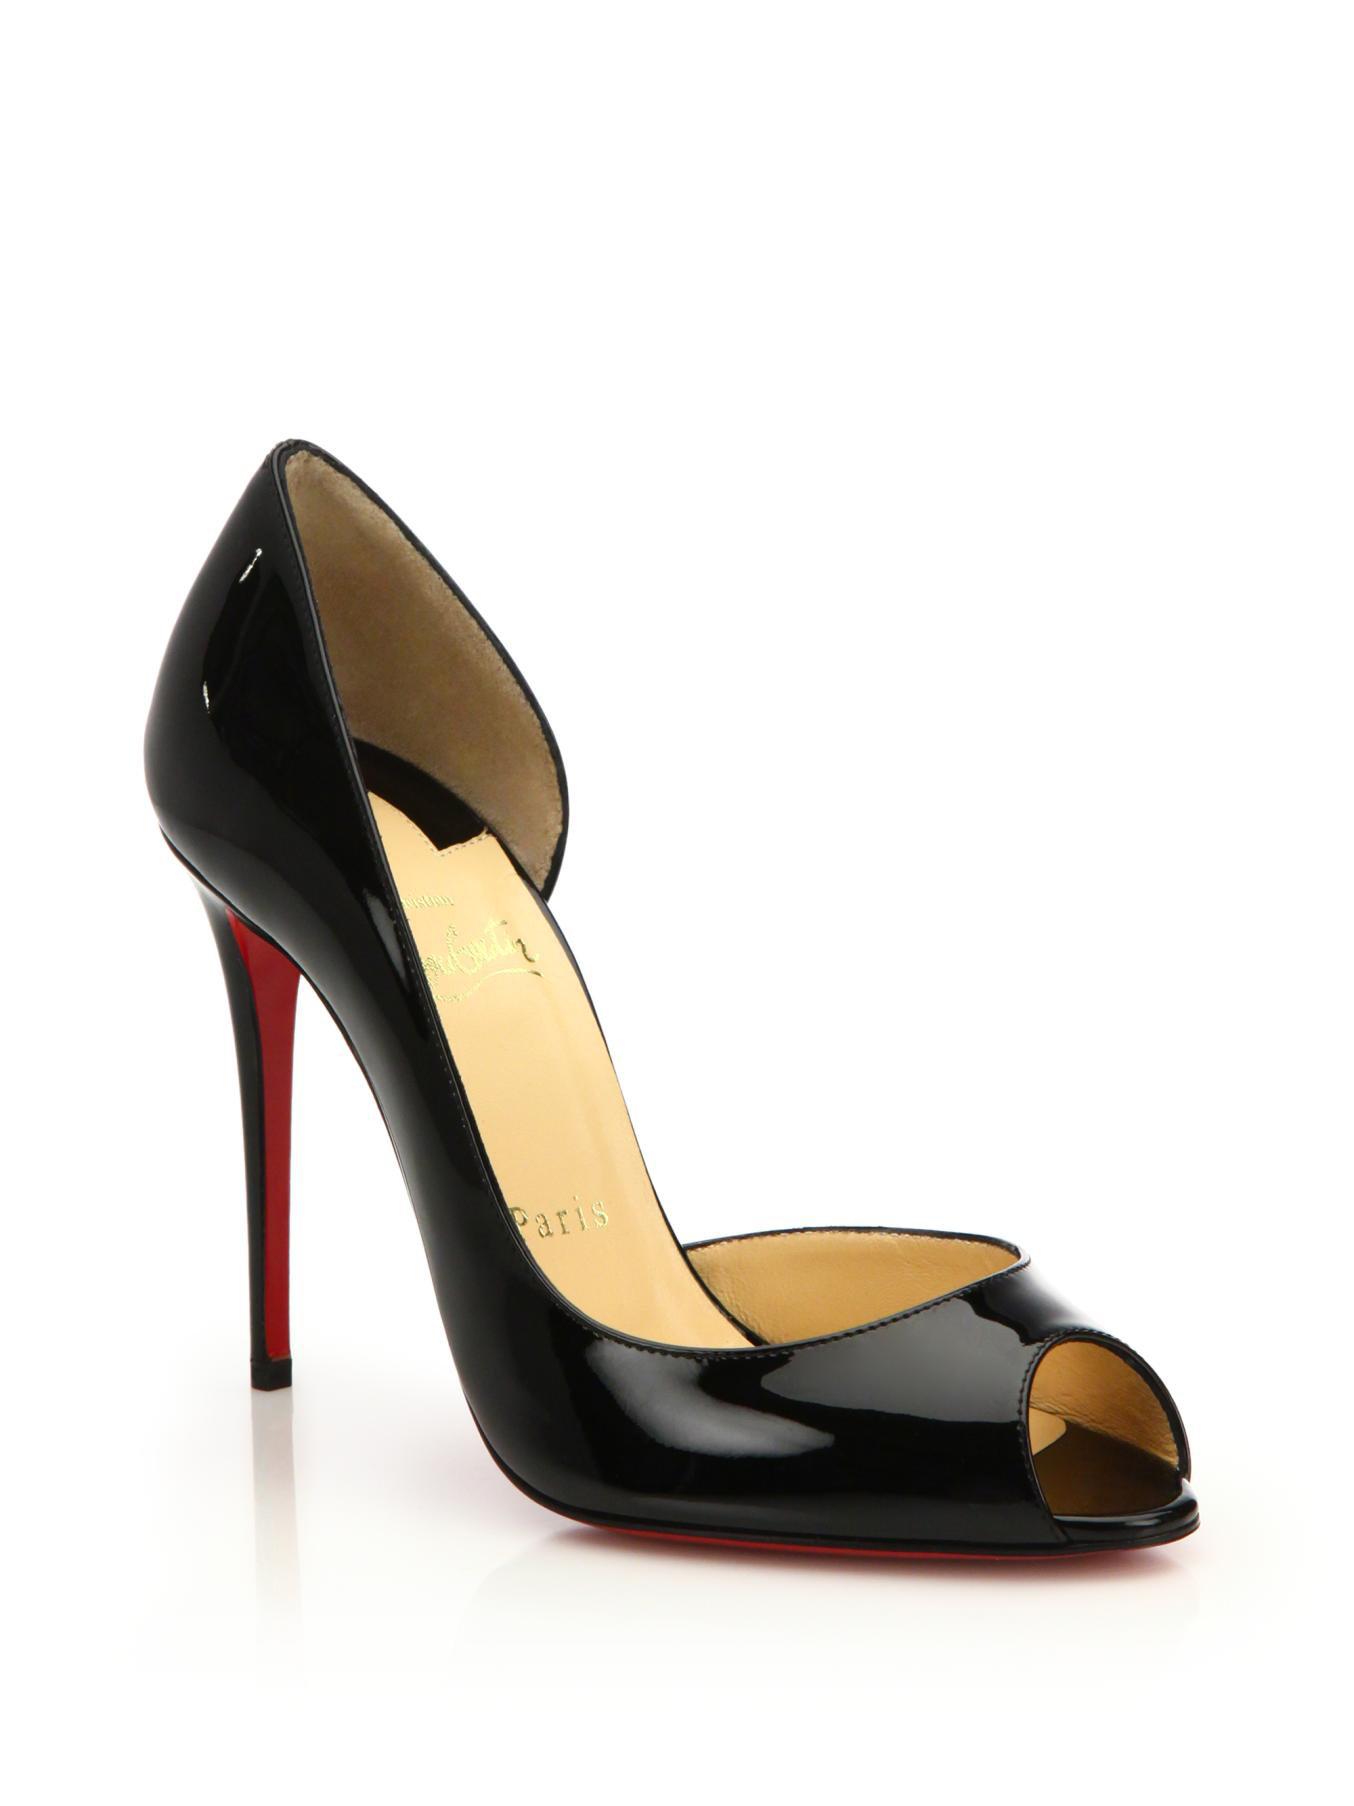 christian louboutin peep-toe wedges Black patent leather corkscrew covered  heels 9e409c2c3791